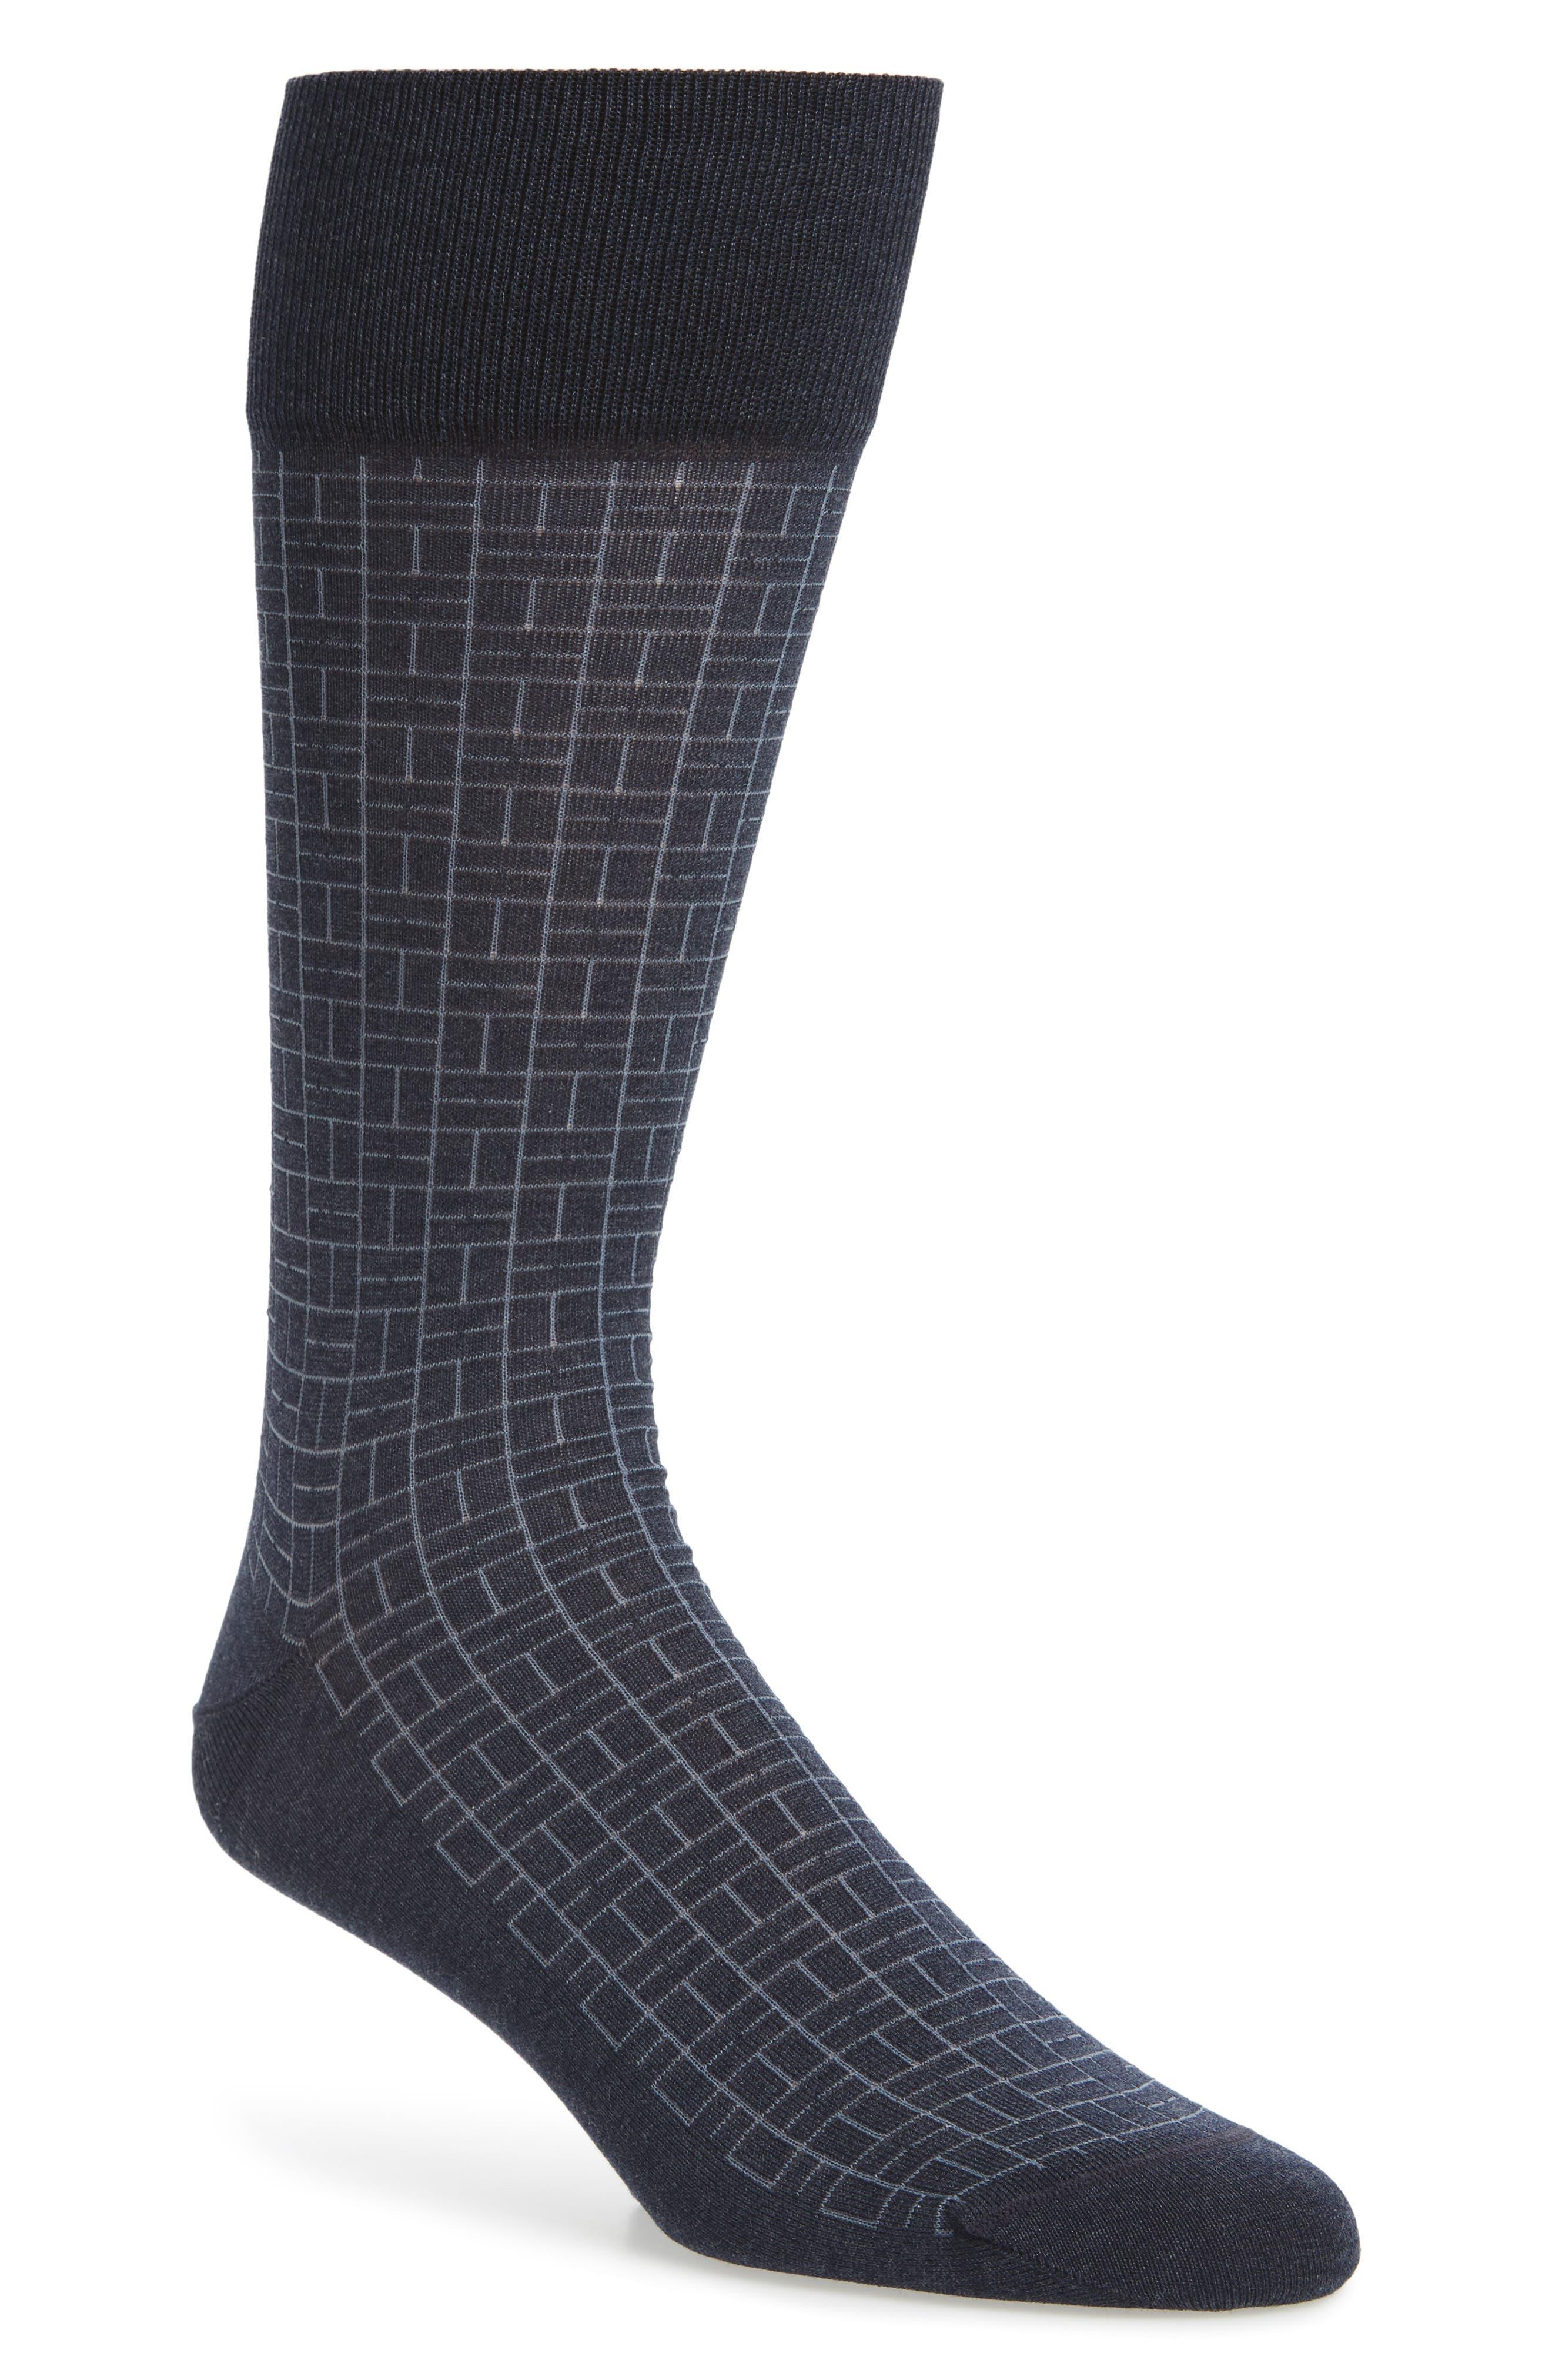 Domino Socks,                             Main thumbnail 1, color,                             Blue Denim